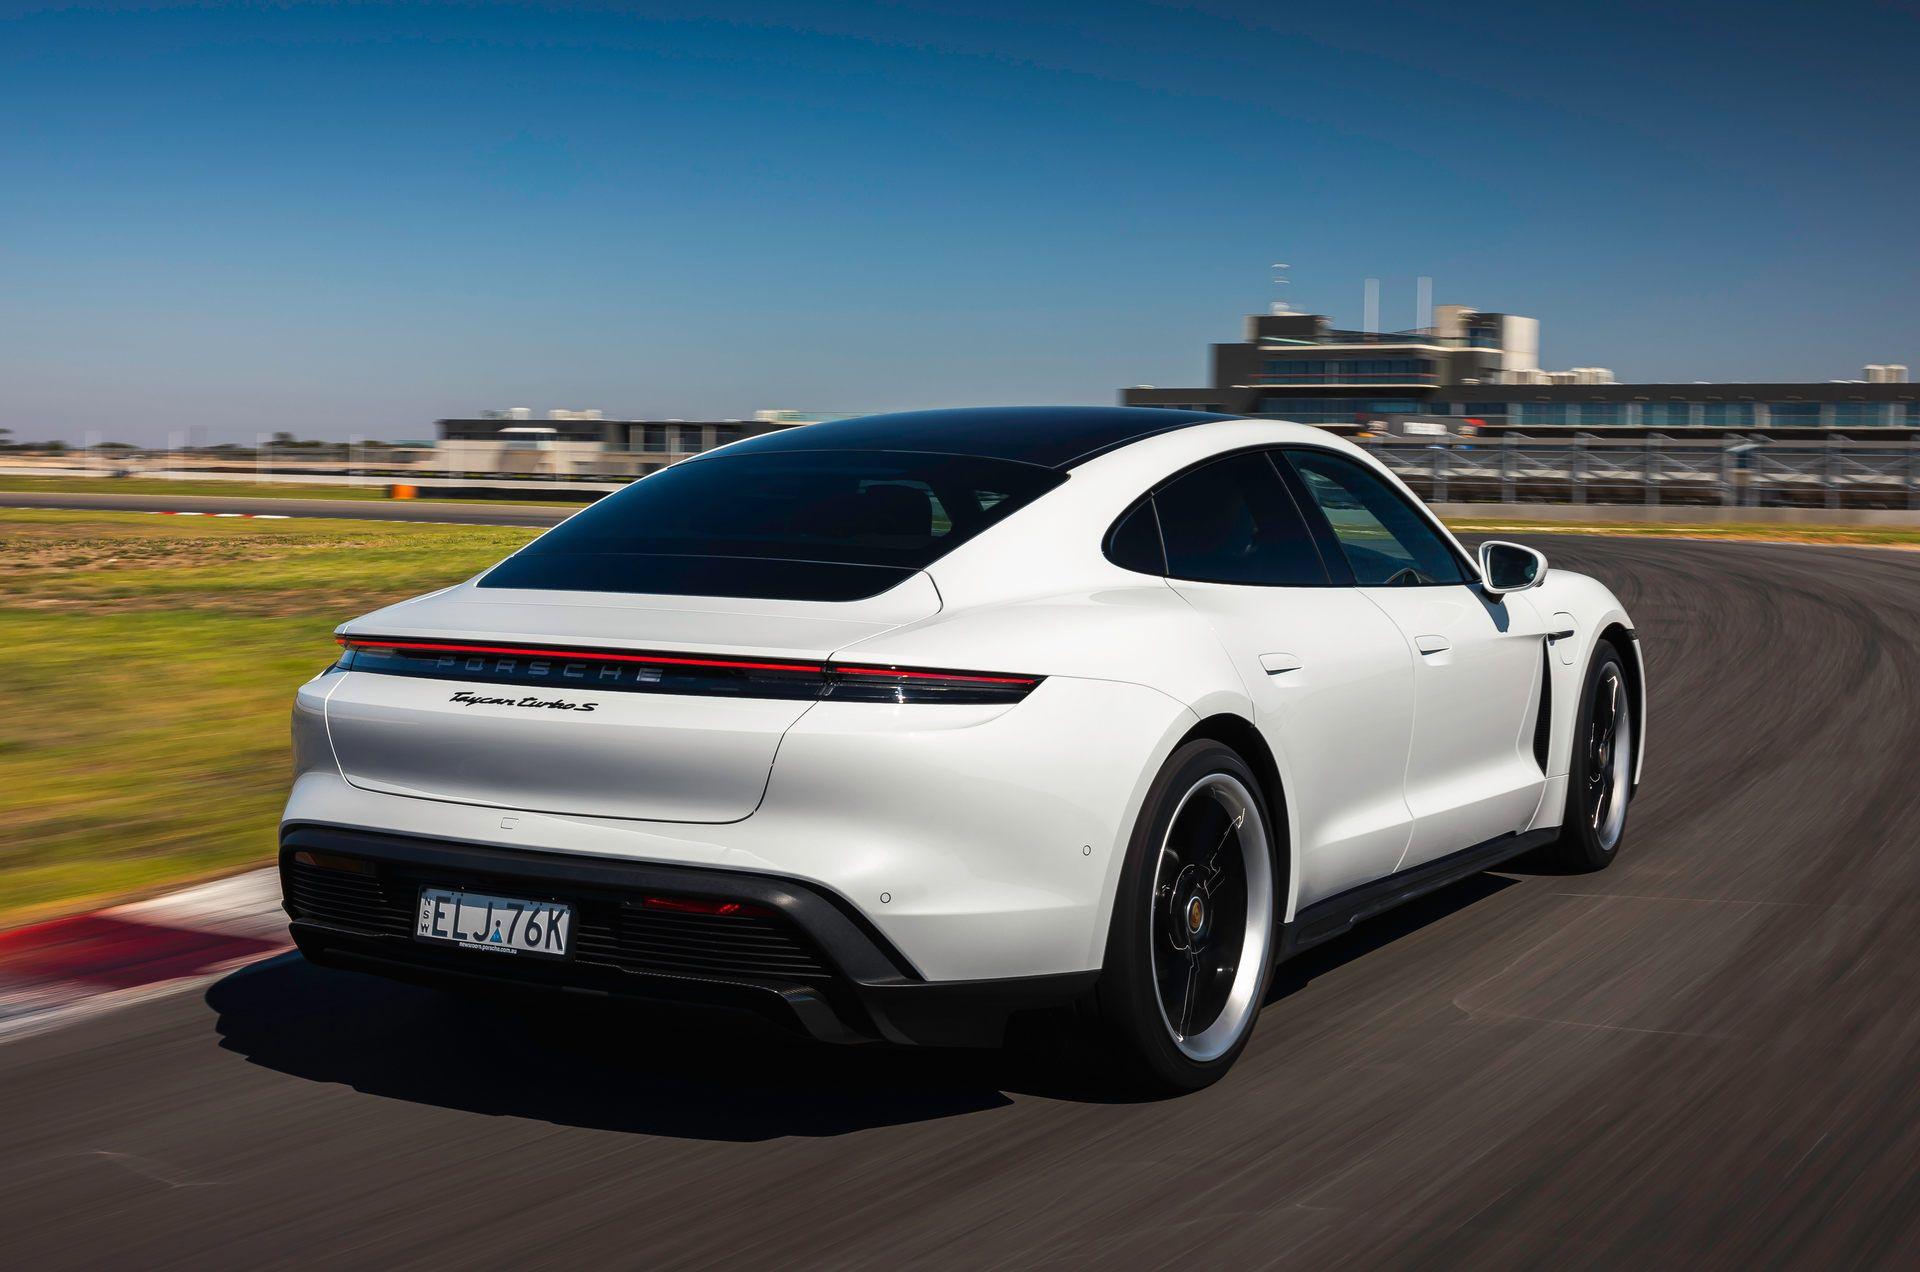 Porsche-Taycan-Turbo-S-The-Bend-Motorsport-Park-48